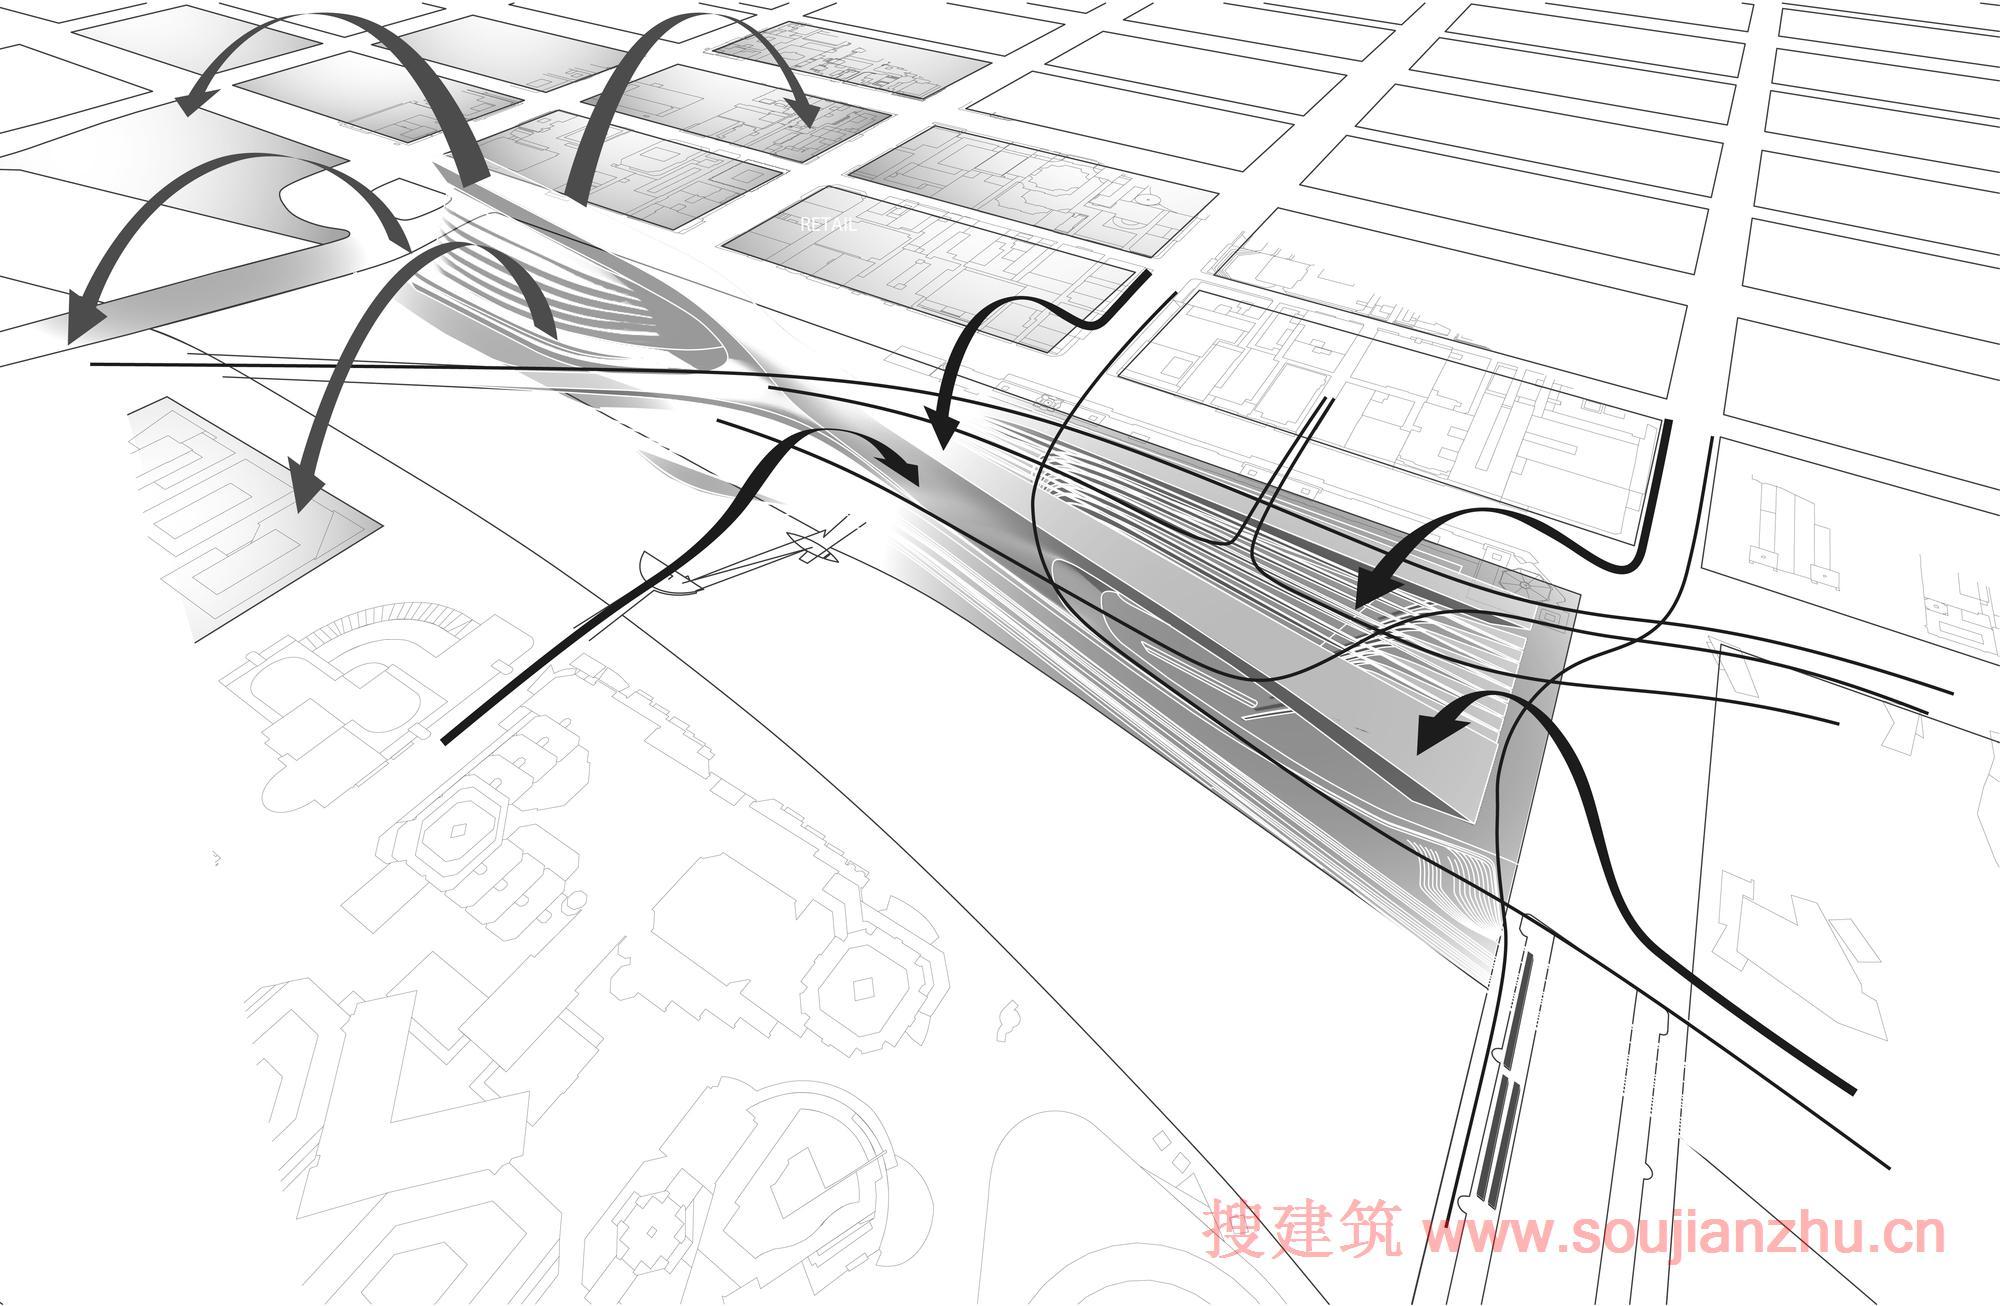 墨尔本·弗林德斯街火车站---zaha hadid architecture & bvn archite